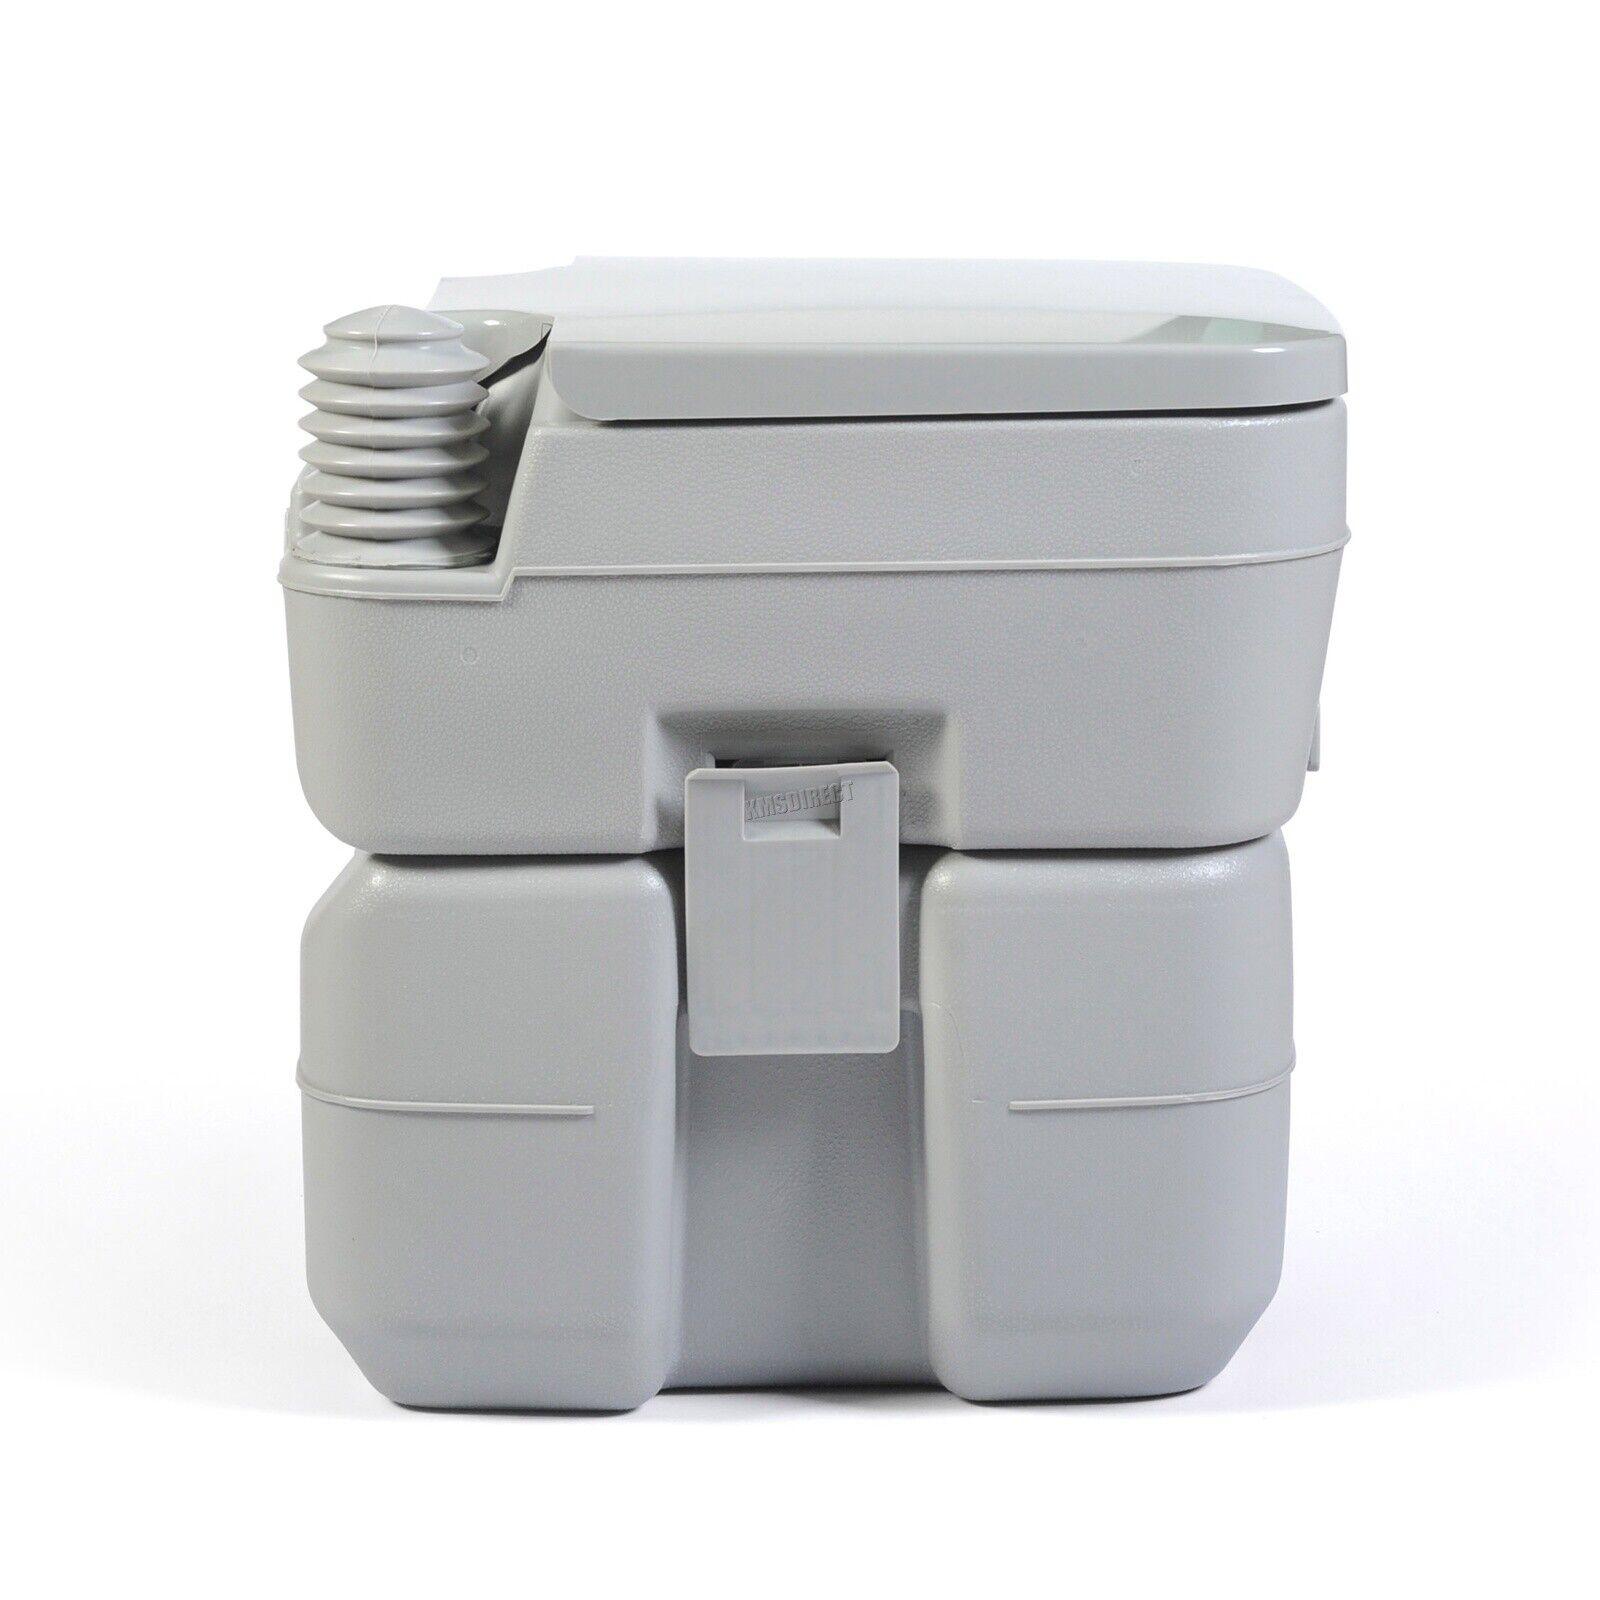 FoxHunter 20L Portable Toilet Flush Caravan Camping Travel WC Loo Porta Potty 5